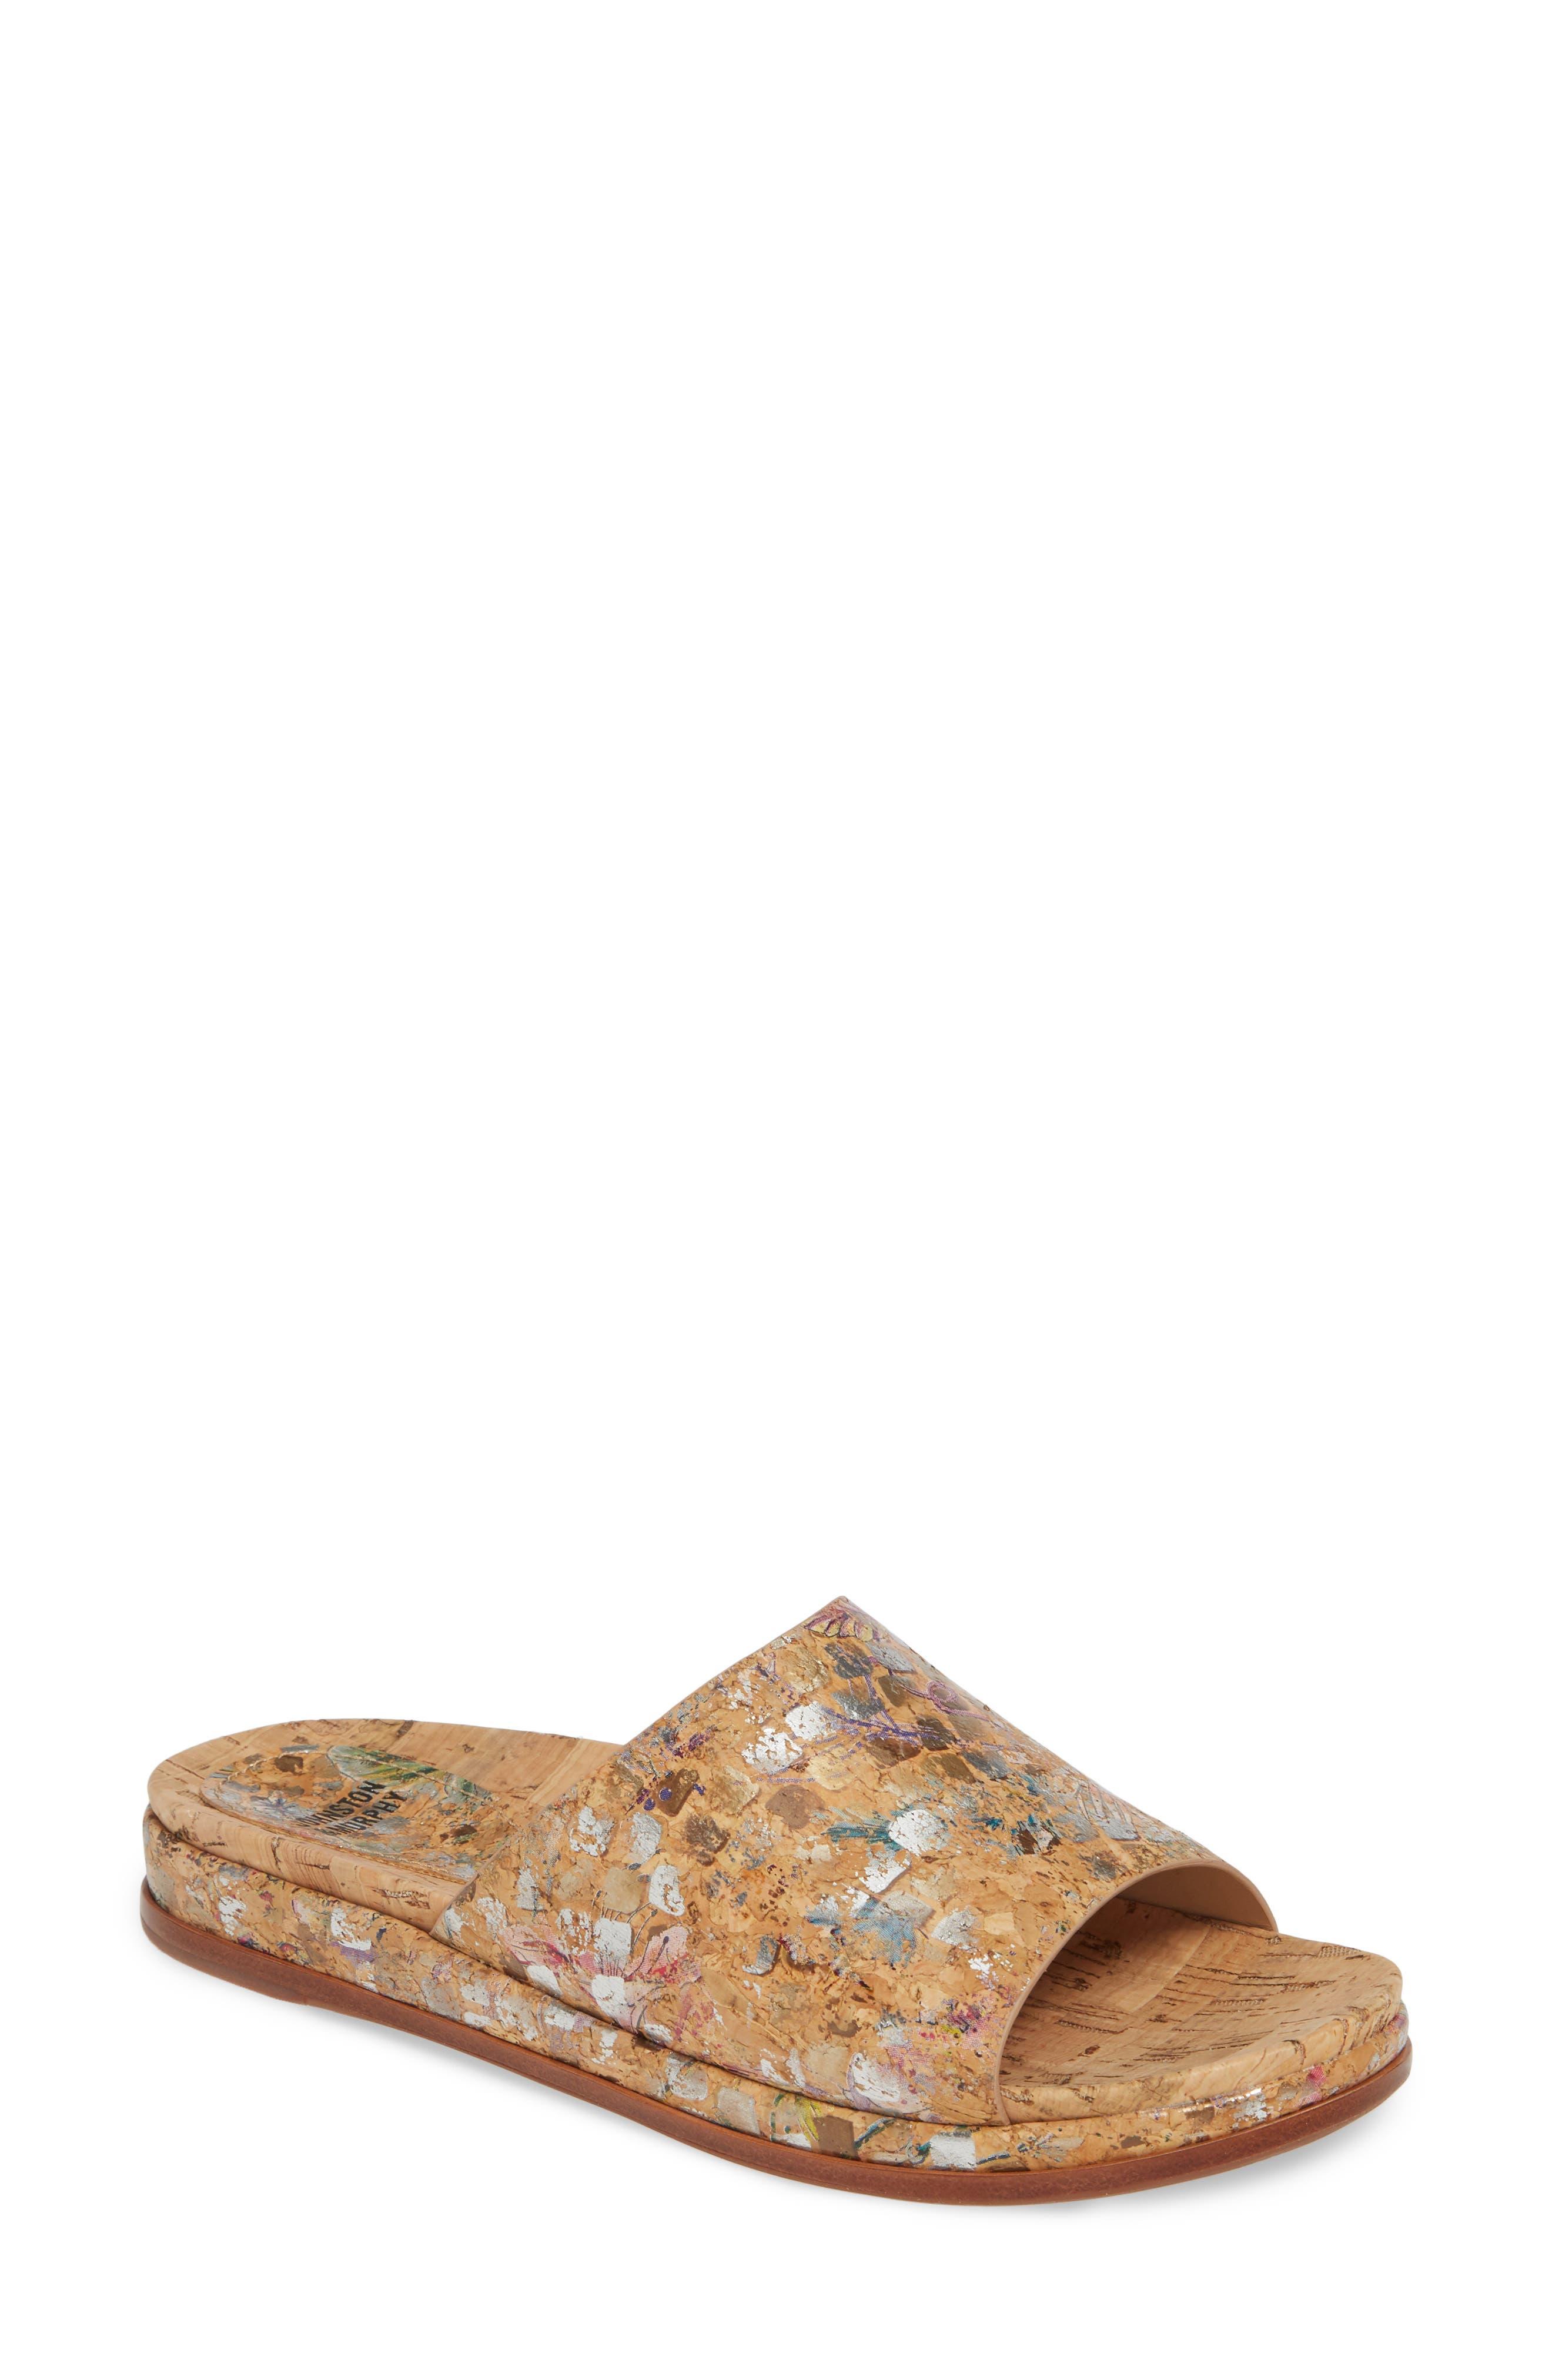 Johnston & Murphy Jenny Slide Sandal, Metallic